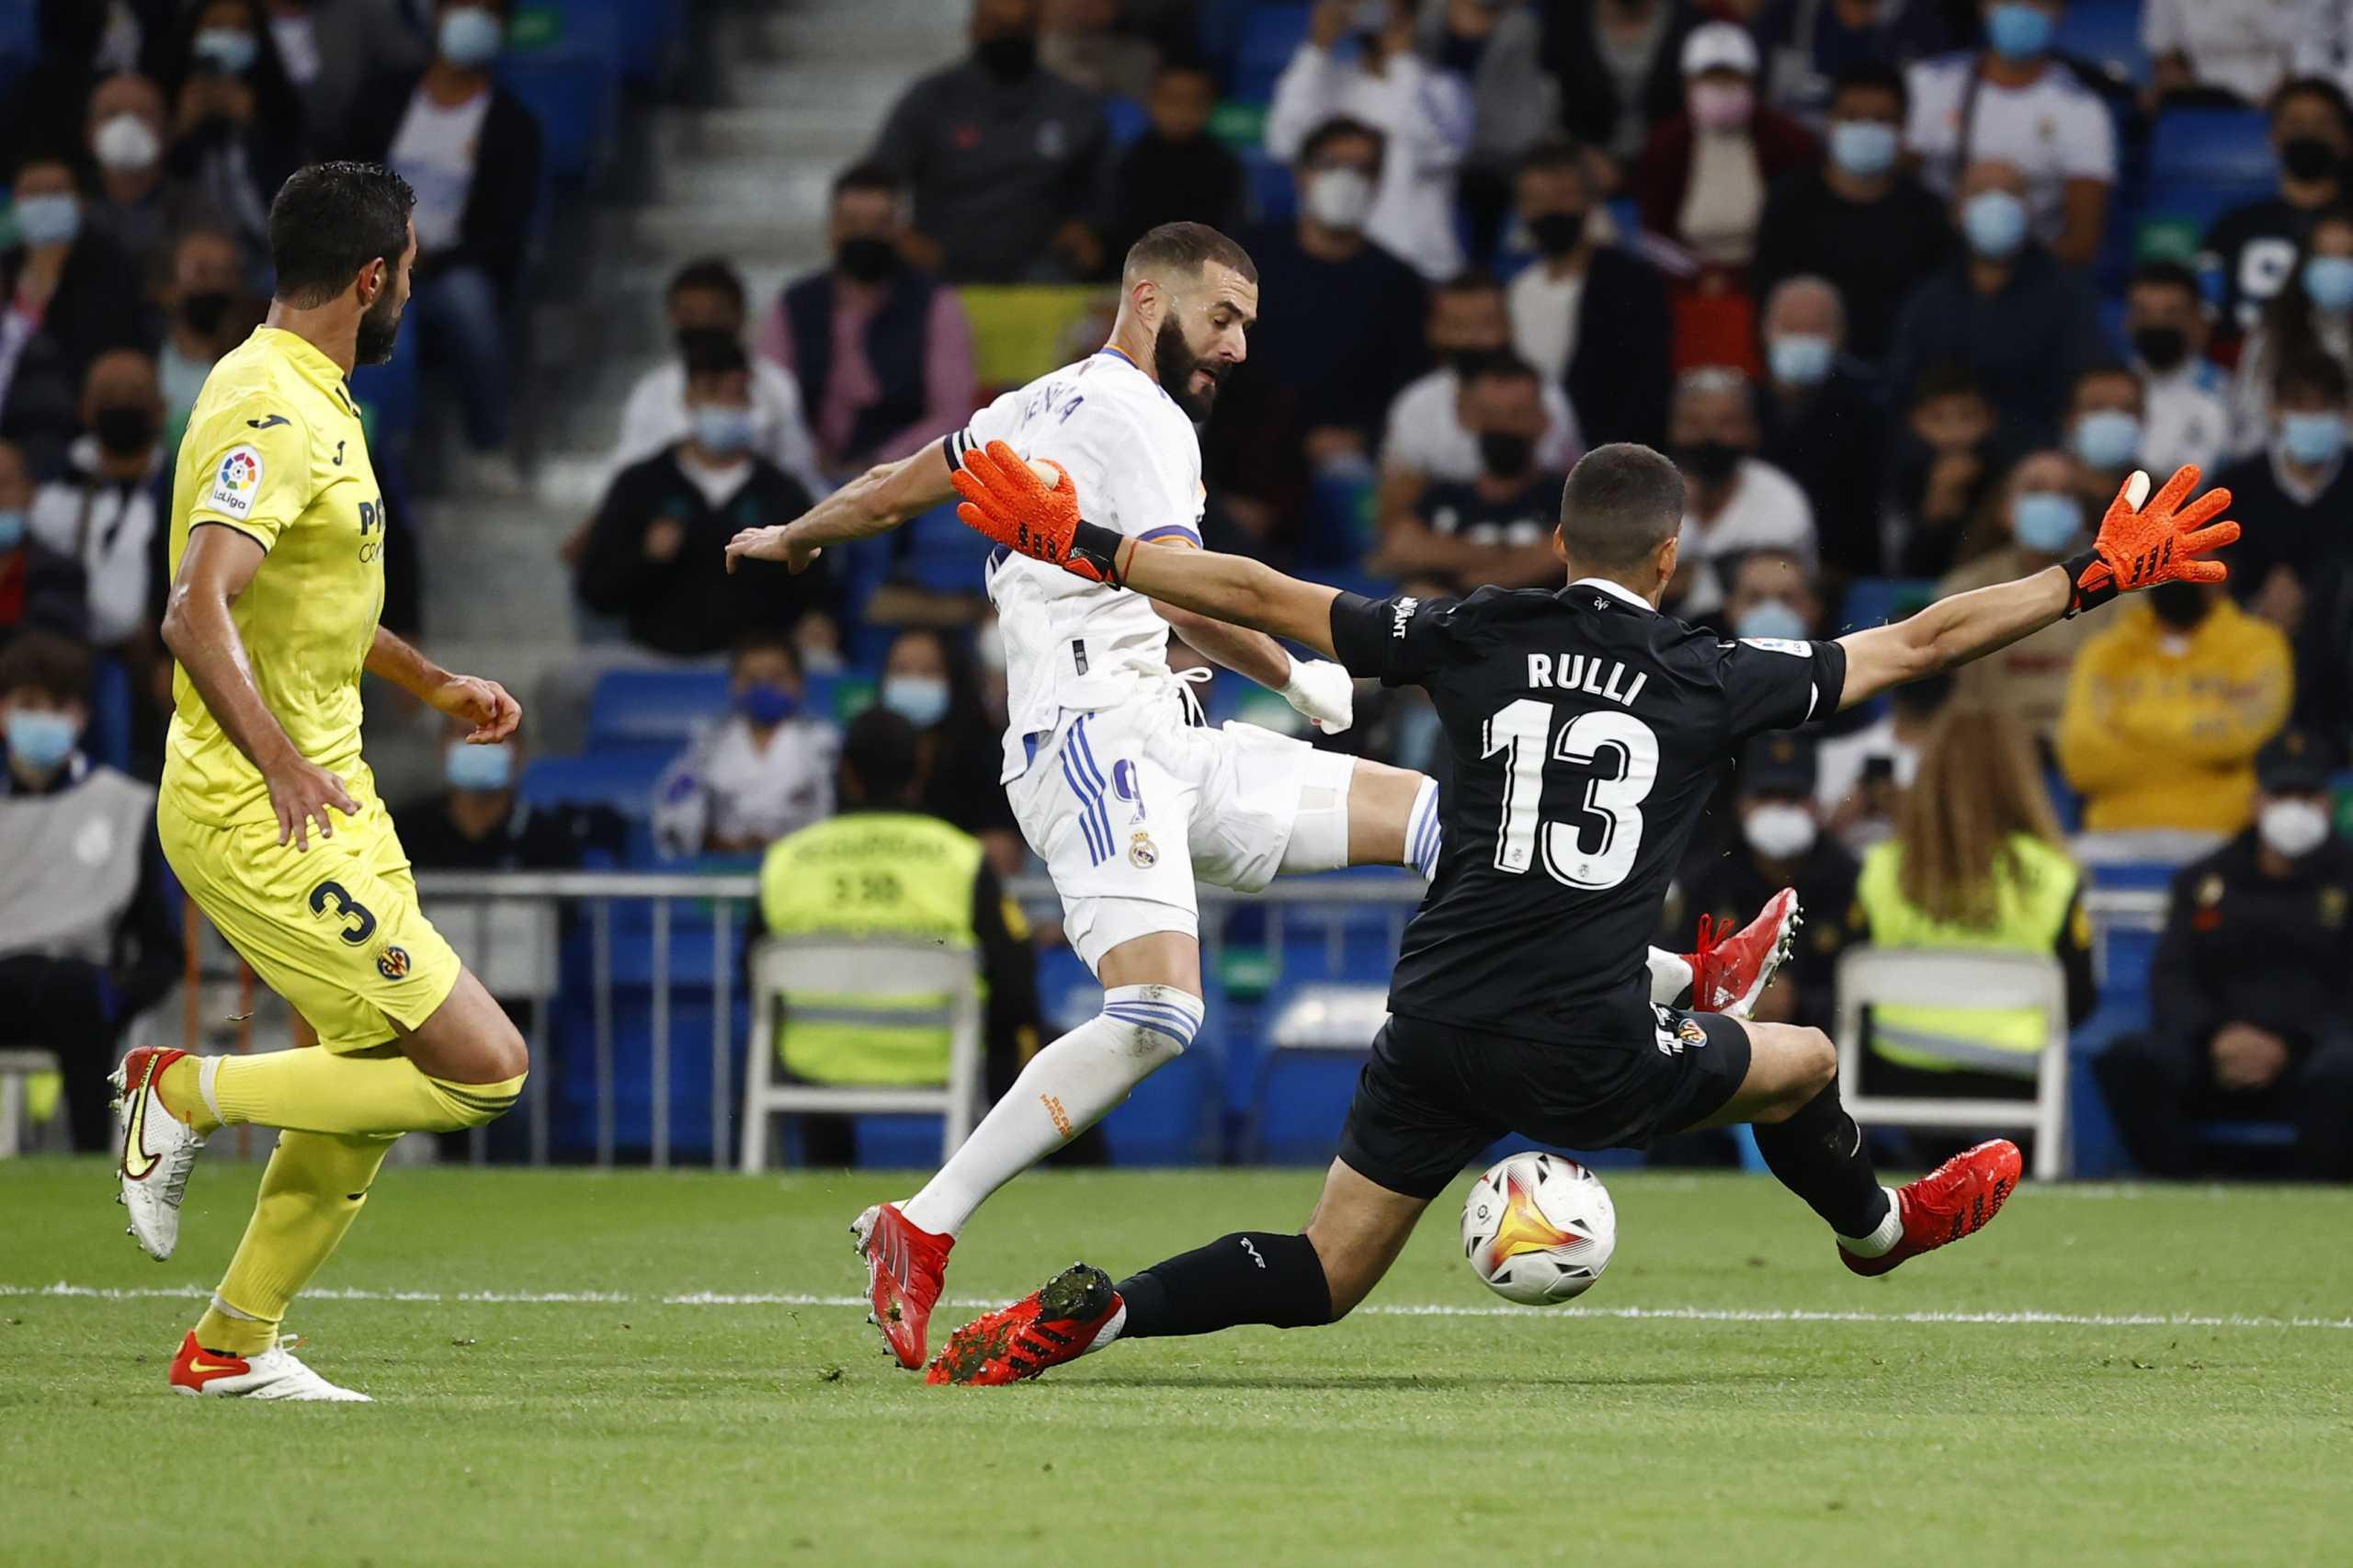 La Liga, Ρεάλ Μαδρίτης – Βιγιαρεάλ 0-0: «Κλώτσησε» το δώρο της Ατλέτικο η «βασίλισσα»